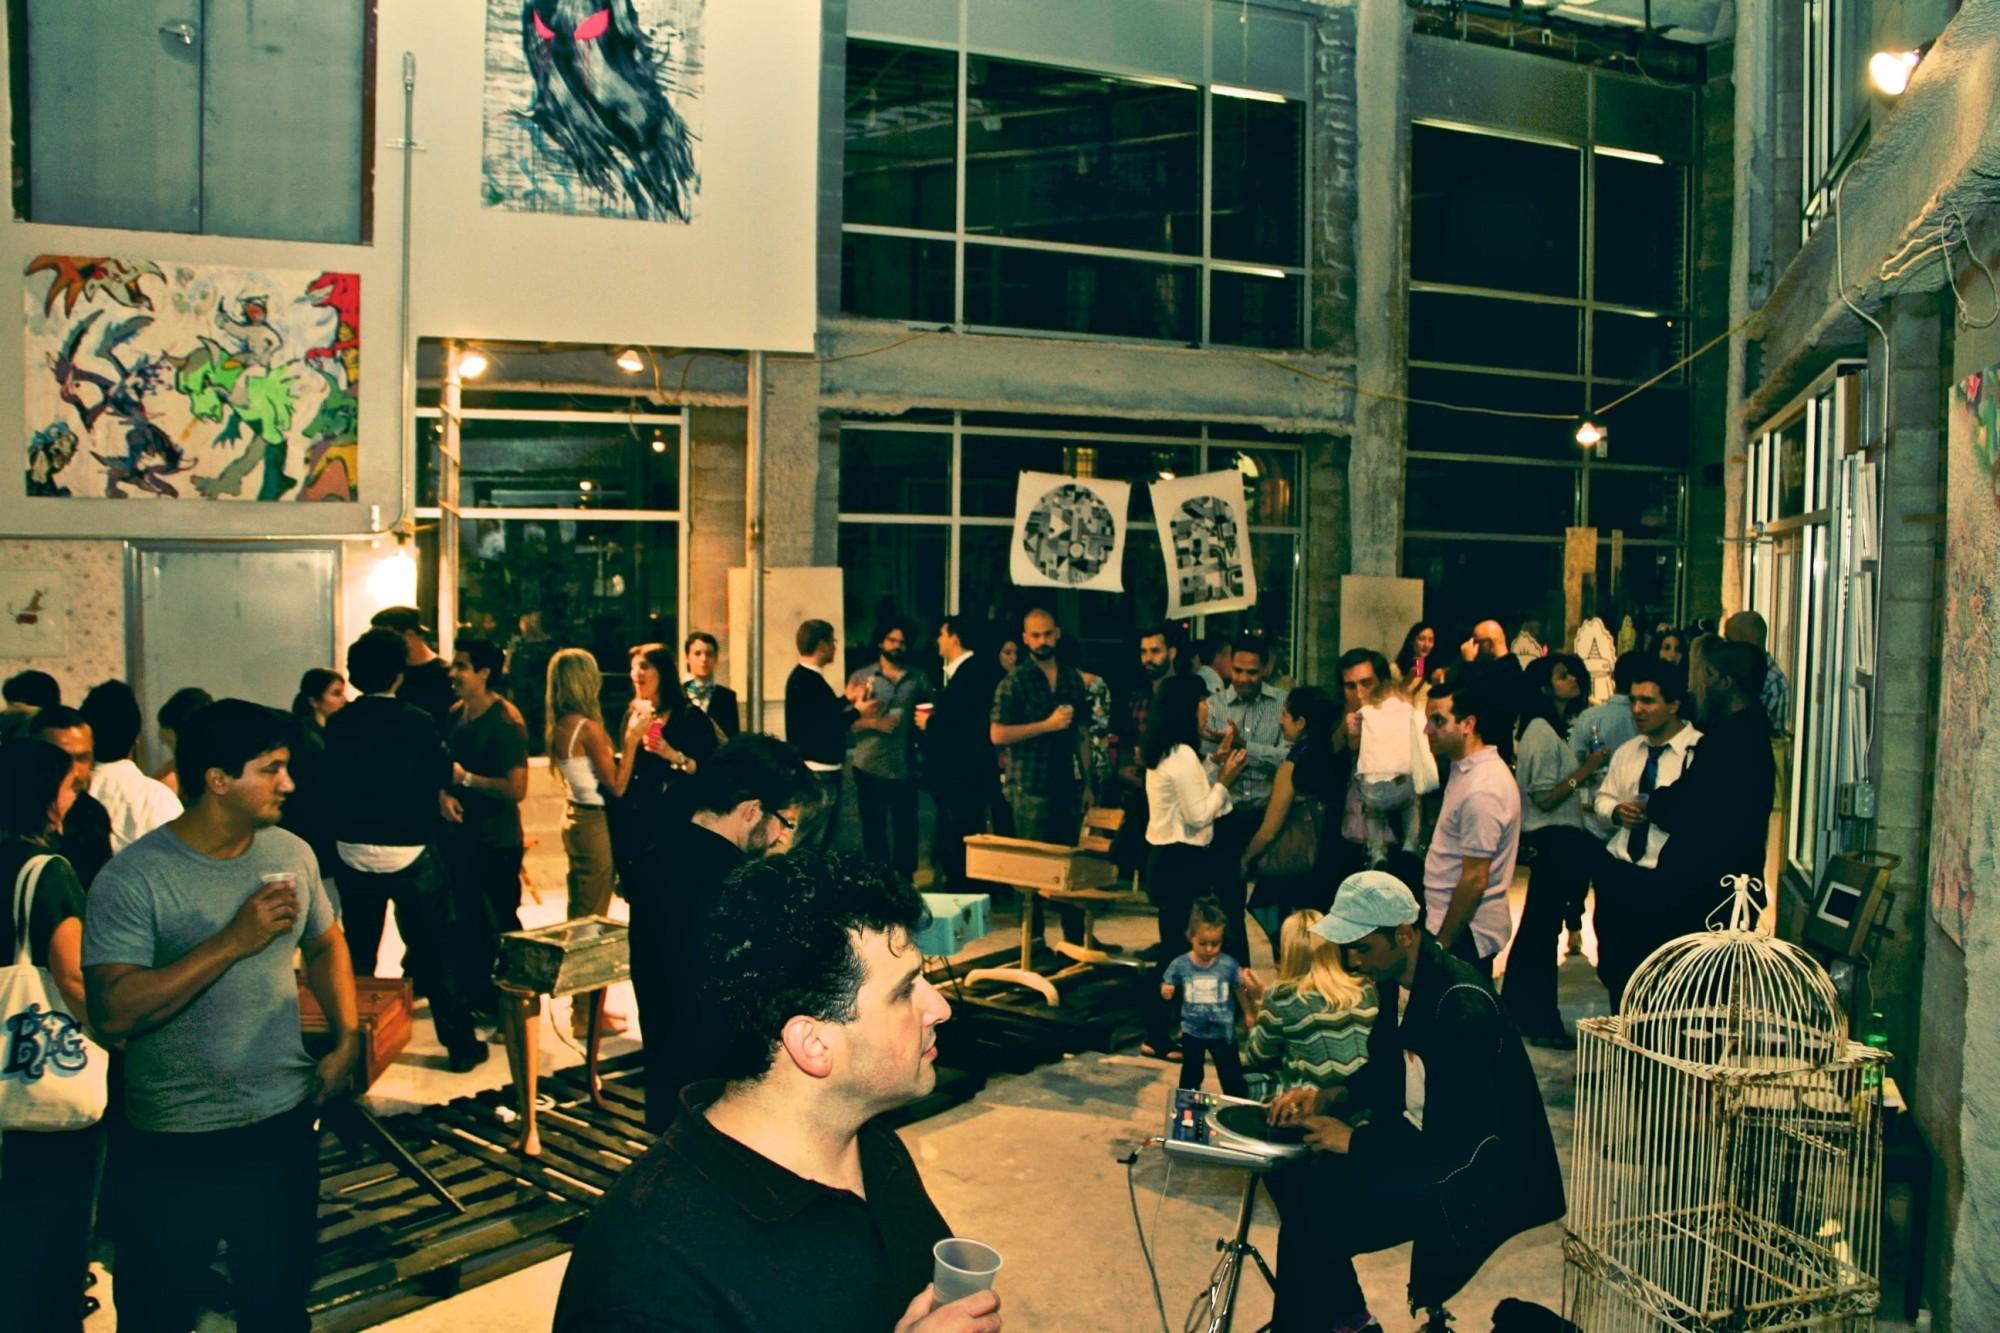 Pop Up Gallery event at Ten63 Jackson